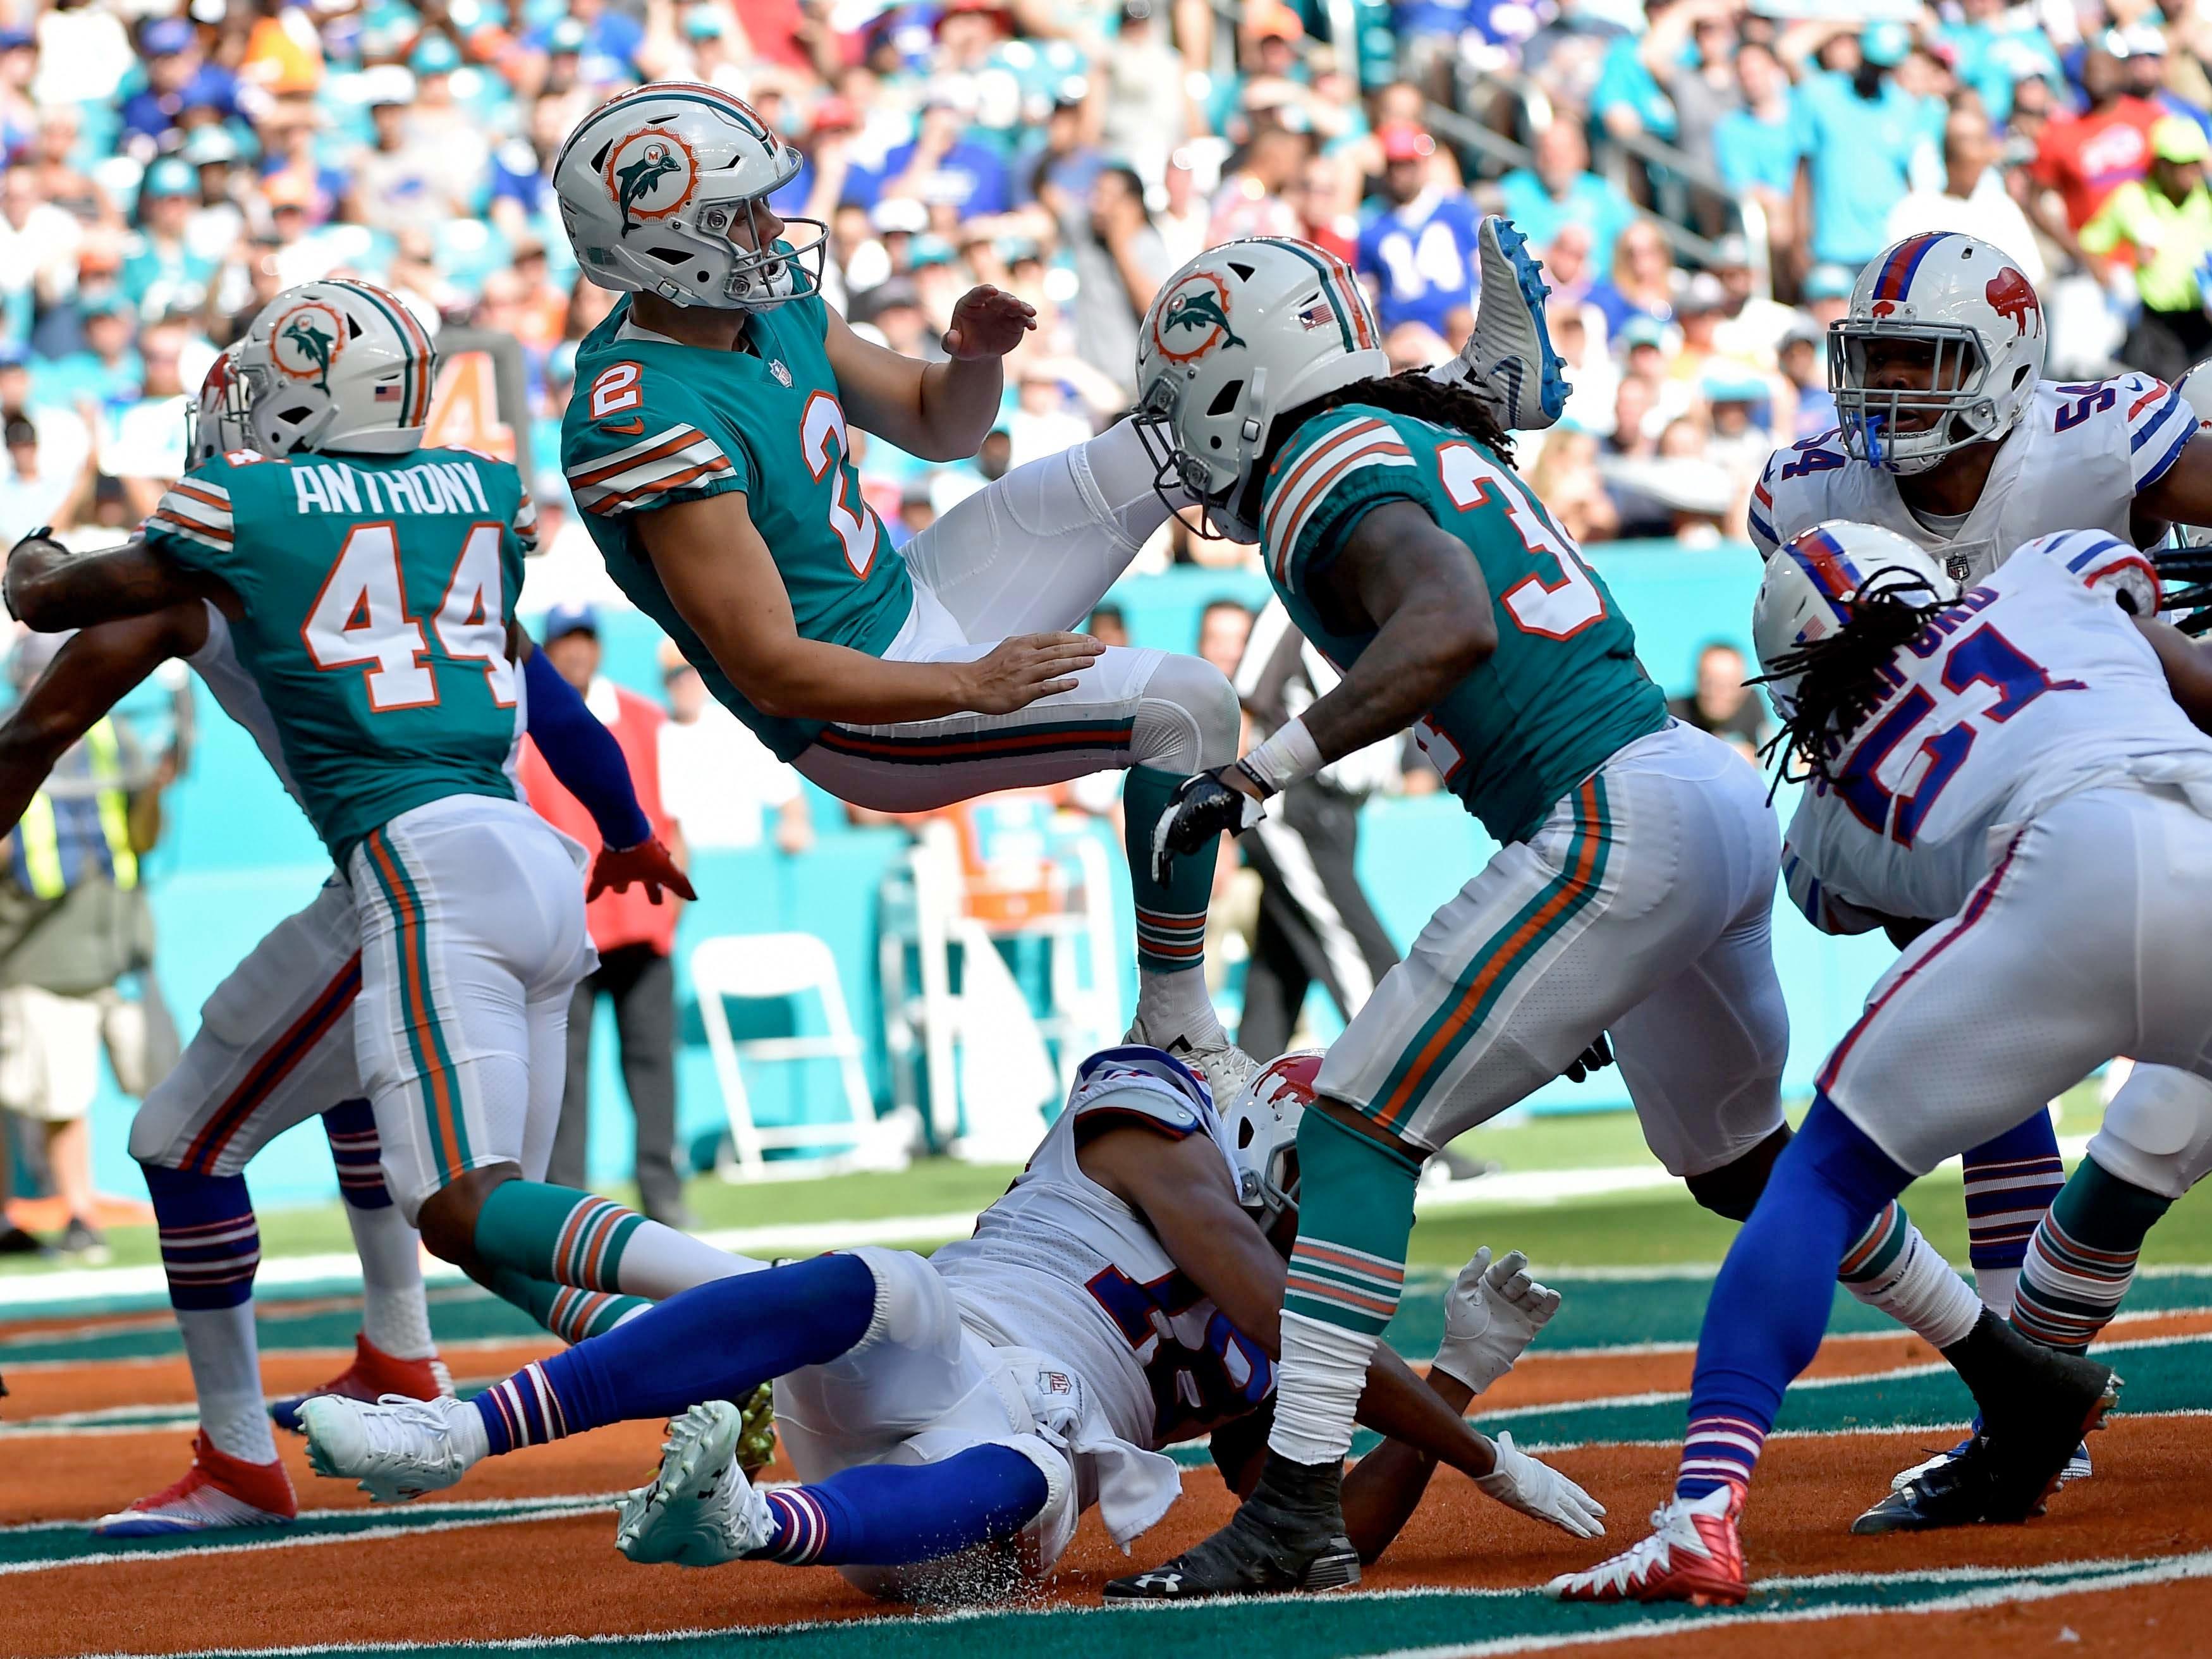 Dec 2, 2018; Miami Gardens, FL, USA; Buffalo Bills wide receiver Andre Holmes (18) runs into Miami Dolphins punter Matt Haack (2) during the first half at Hard Rock Stadium. Mandatory Credit: Steve Mitchell-USA TODAY Sports